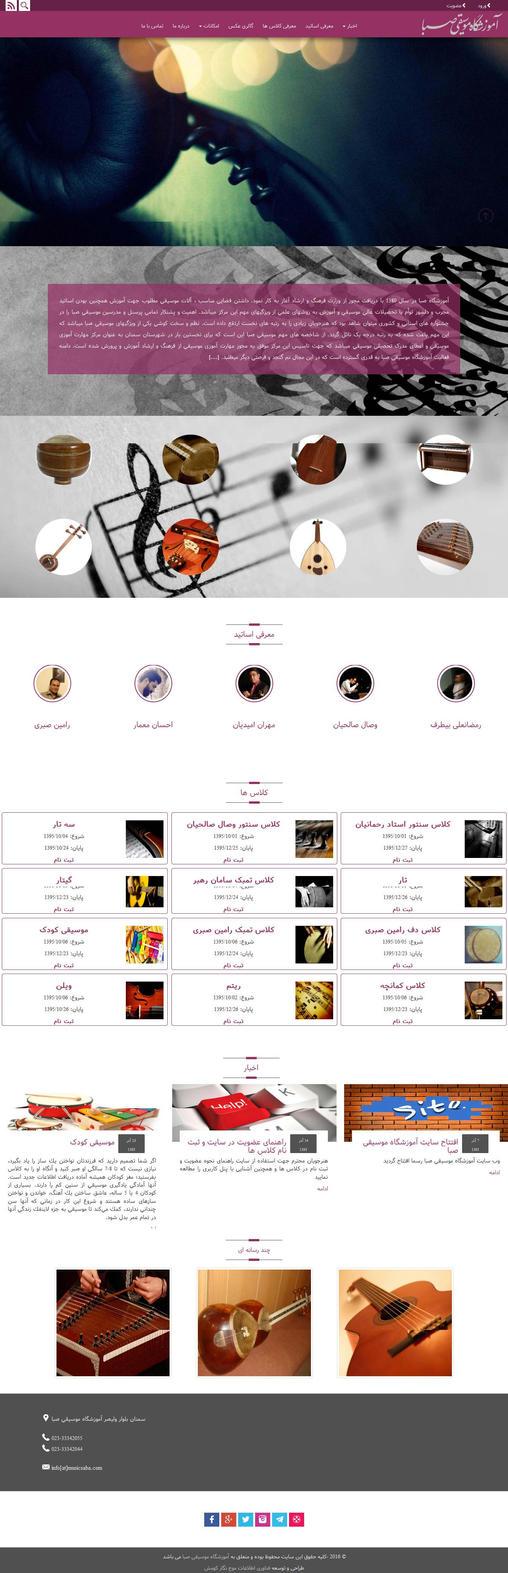 music saba web interface flat design by mojnegar